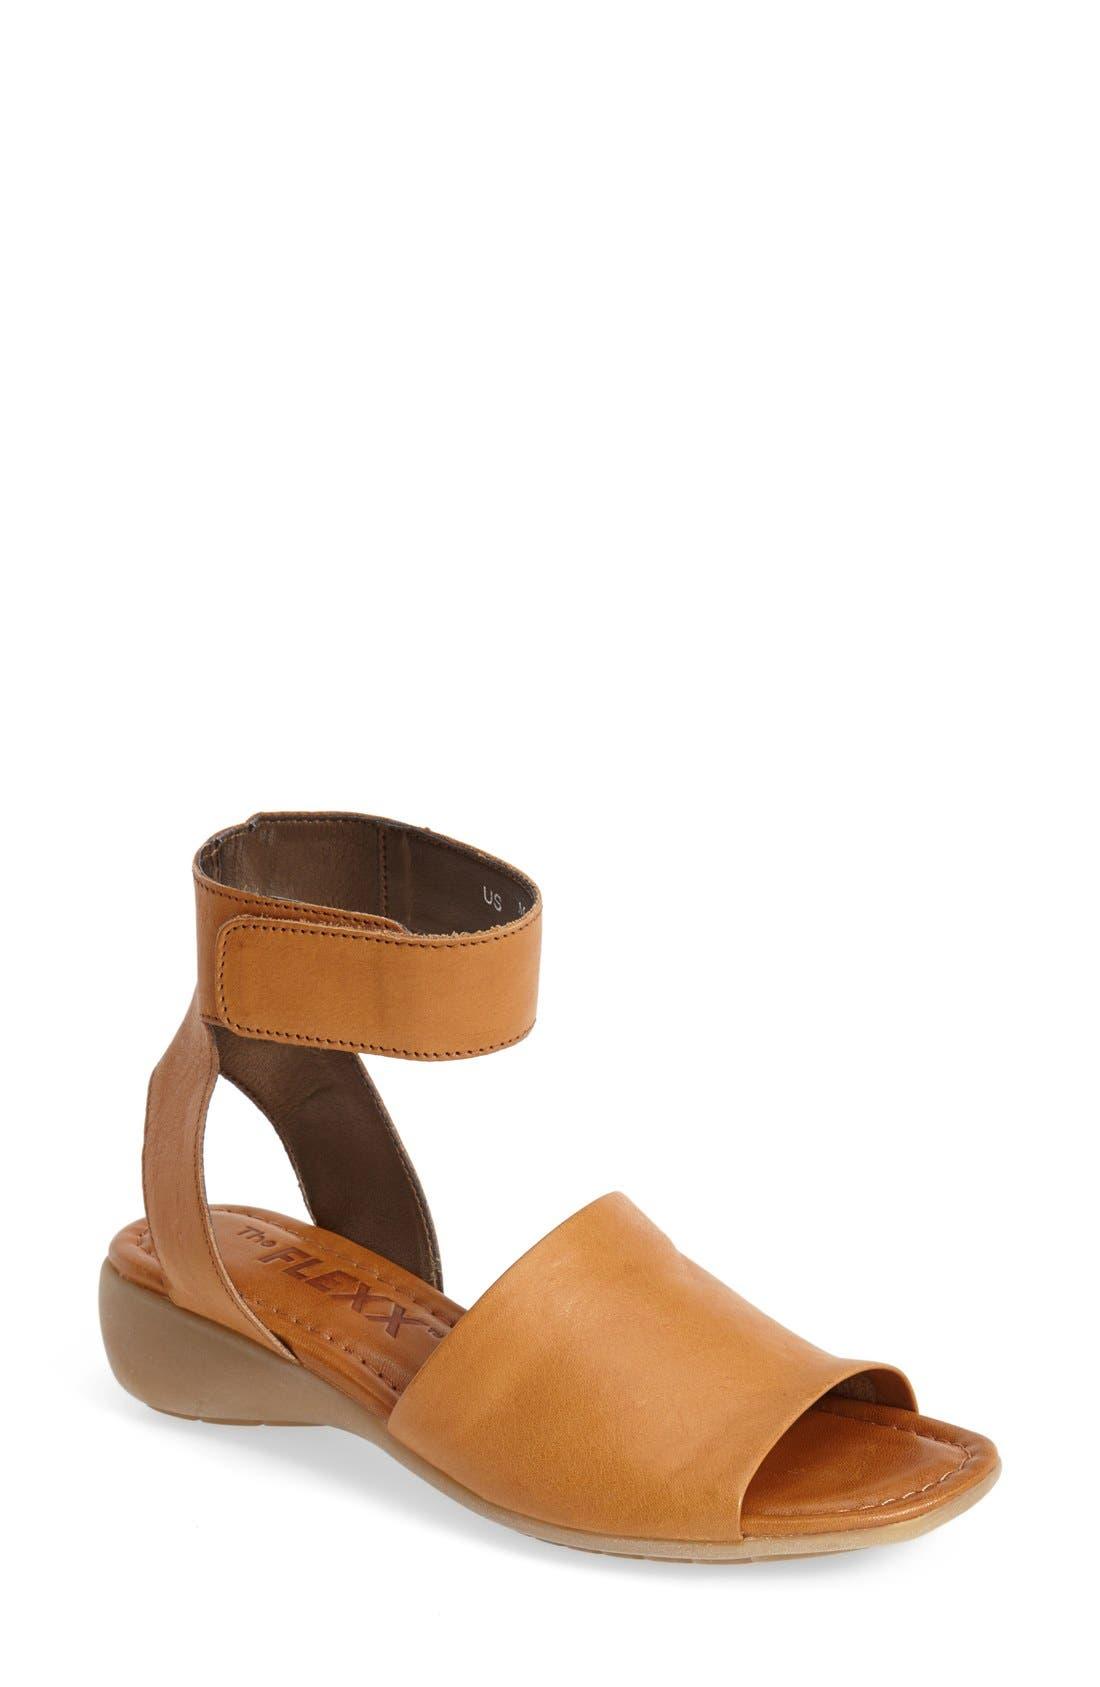 'Beglad' Leather Ankle Strap Sandal,                             Main thumbnail 11, color,